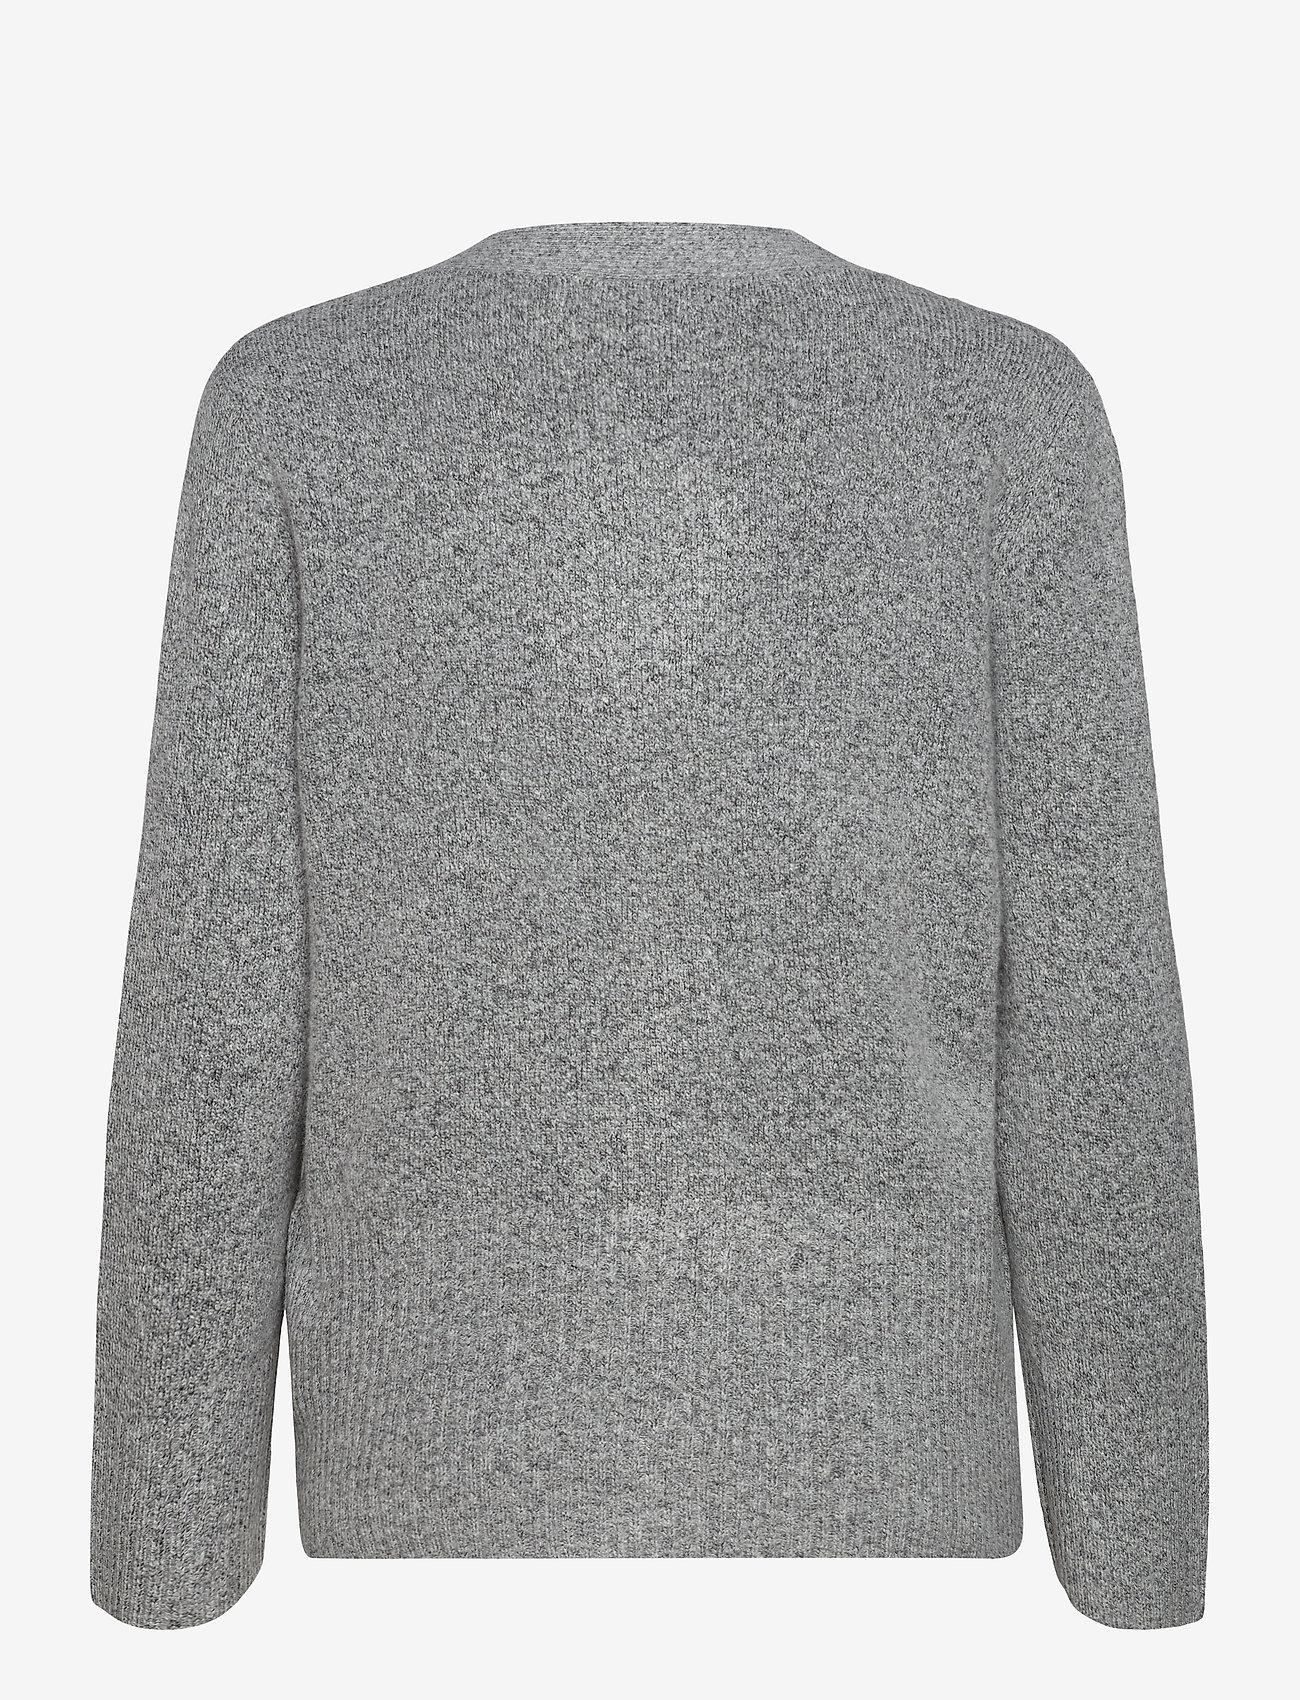 SAND - 5210 - Alp Cardigan - cardigans - grey - 1